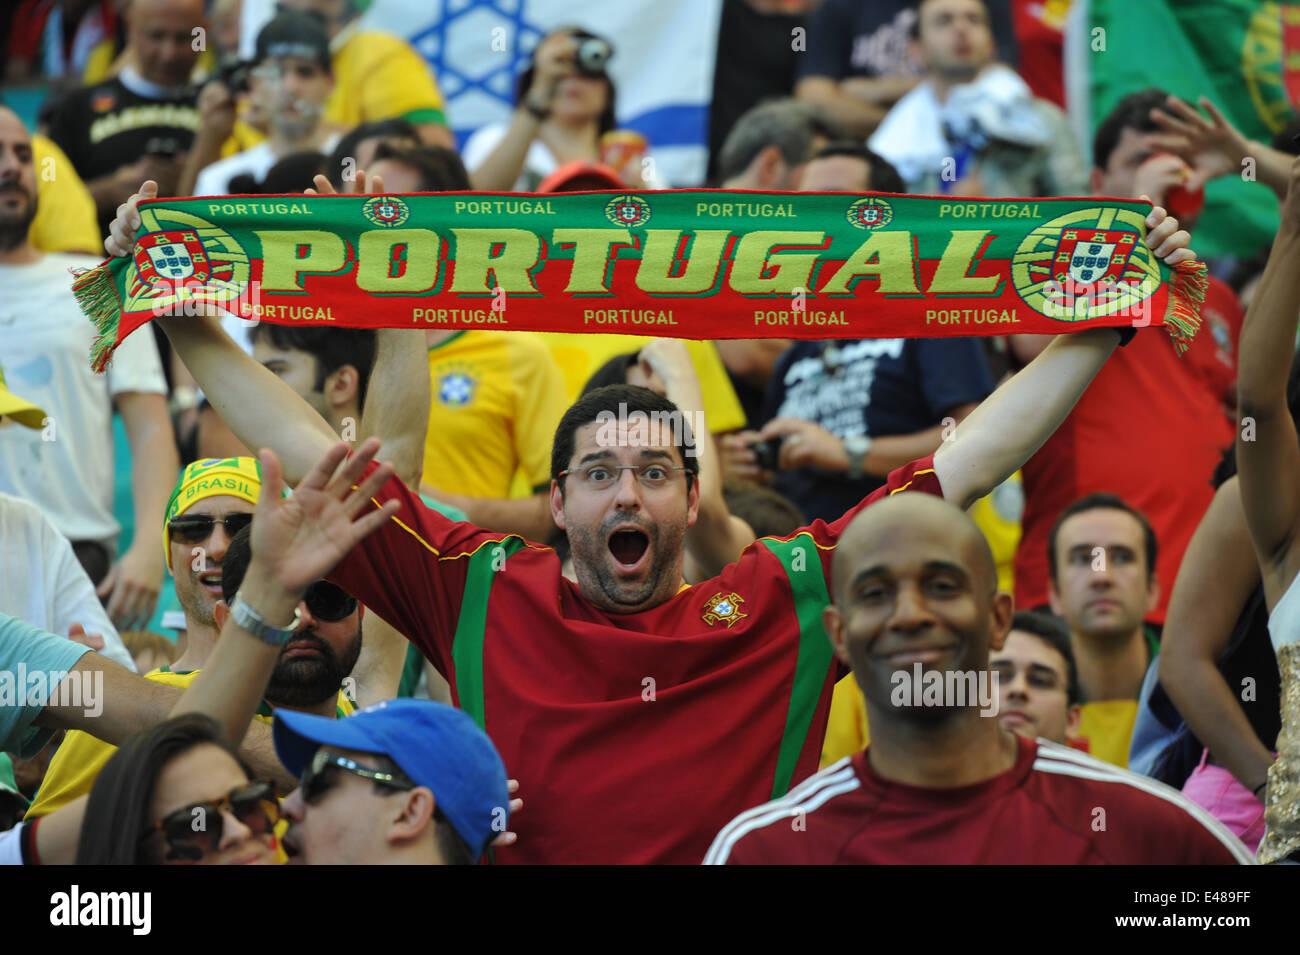 WM 2014, Salvador da Bahia, portugiesische Fans, Deutschland vs. Portugal. Editorial use only. - Stock Image